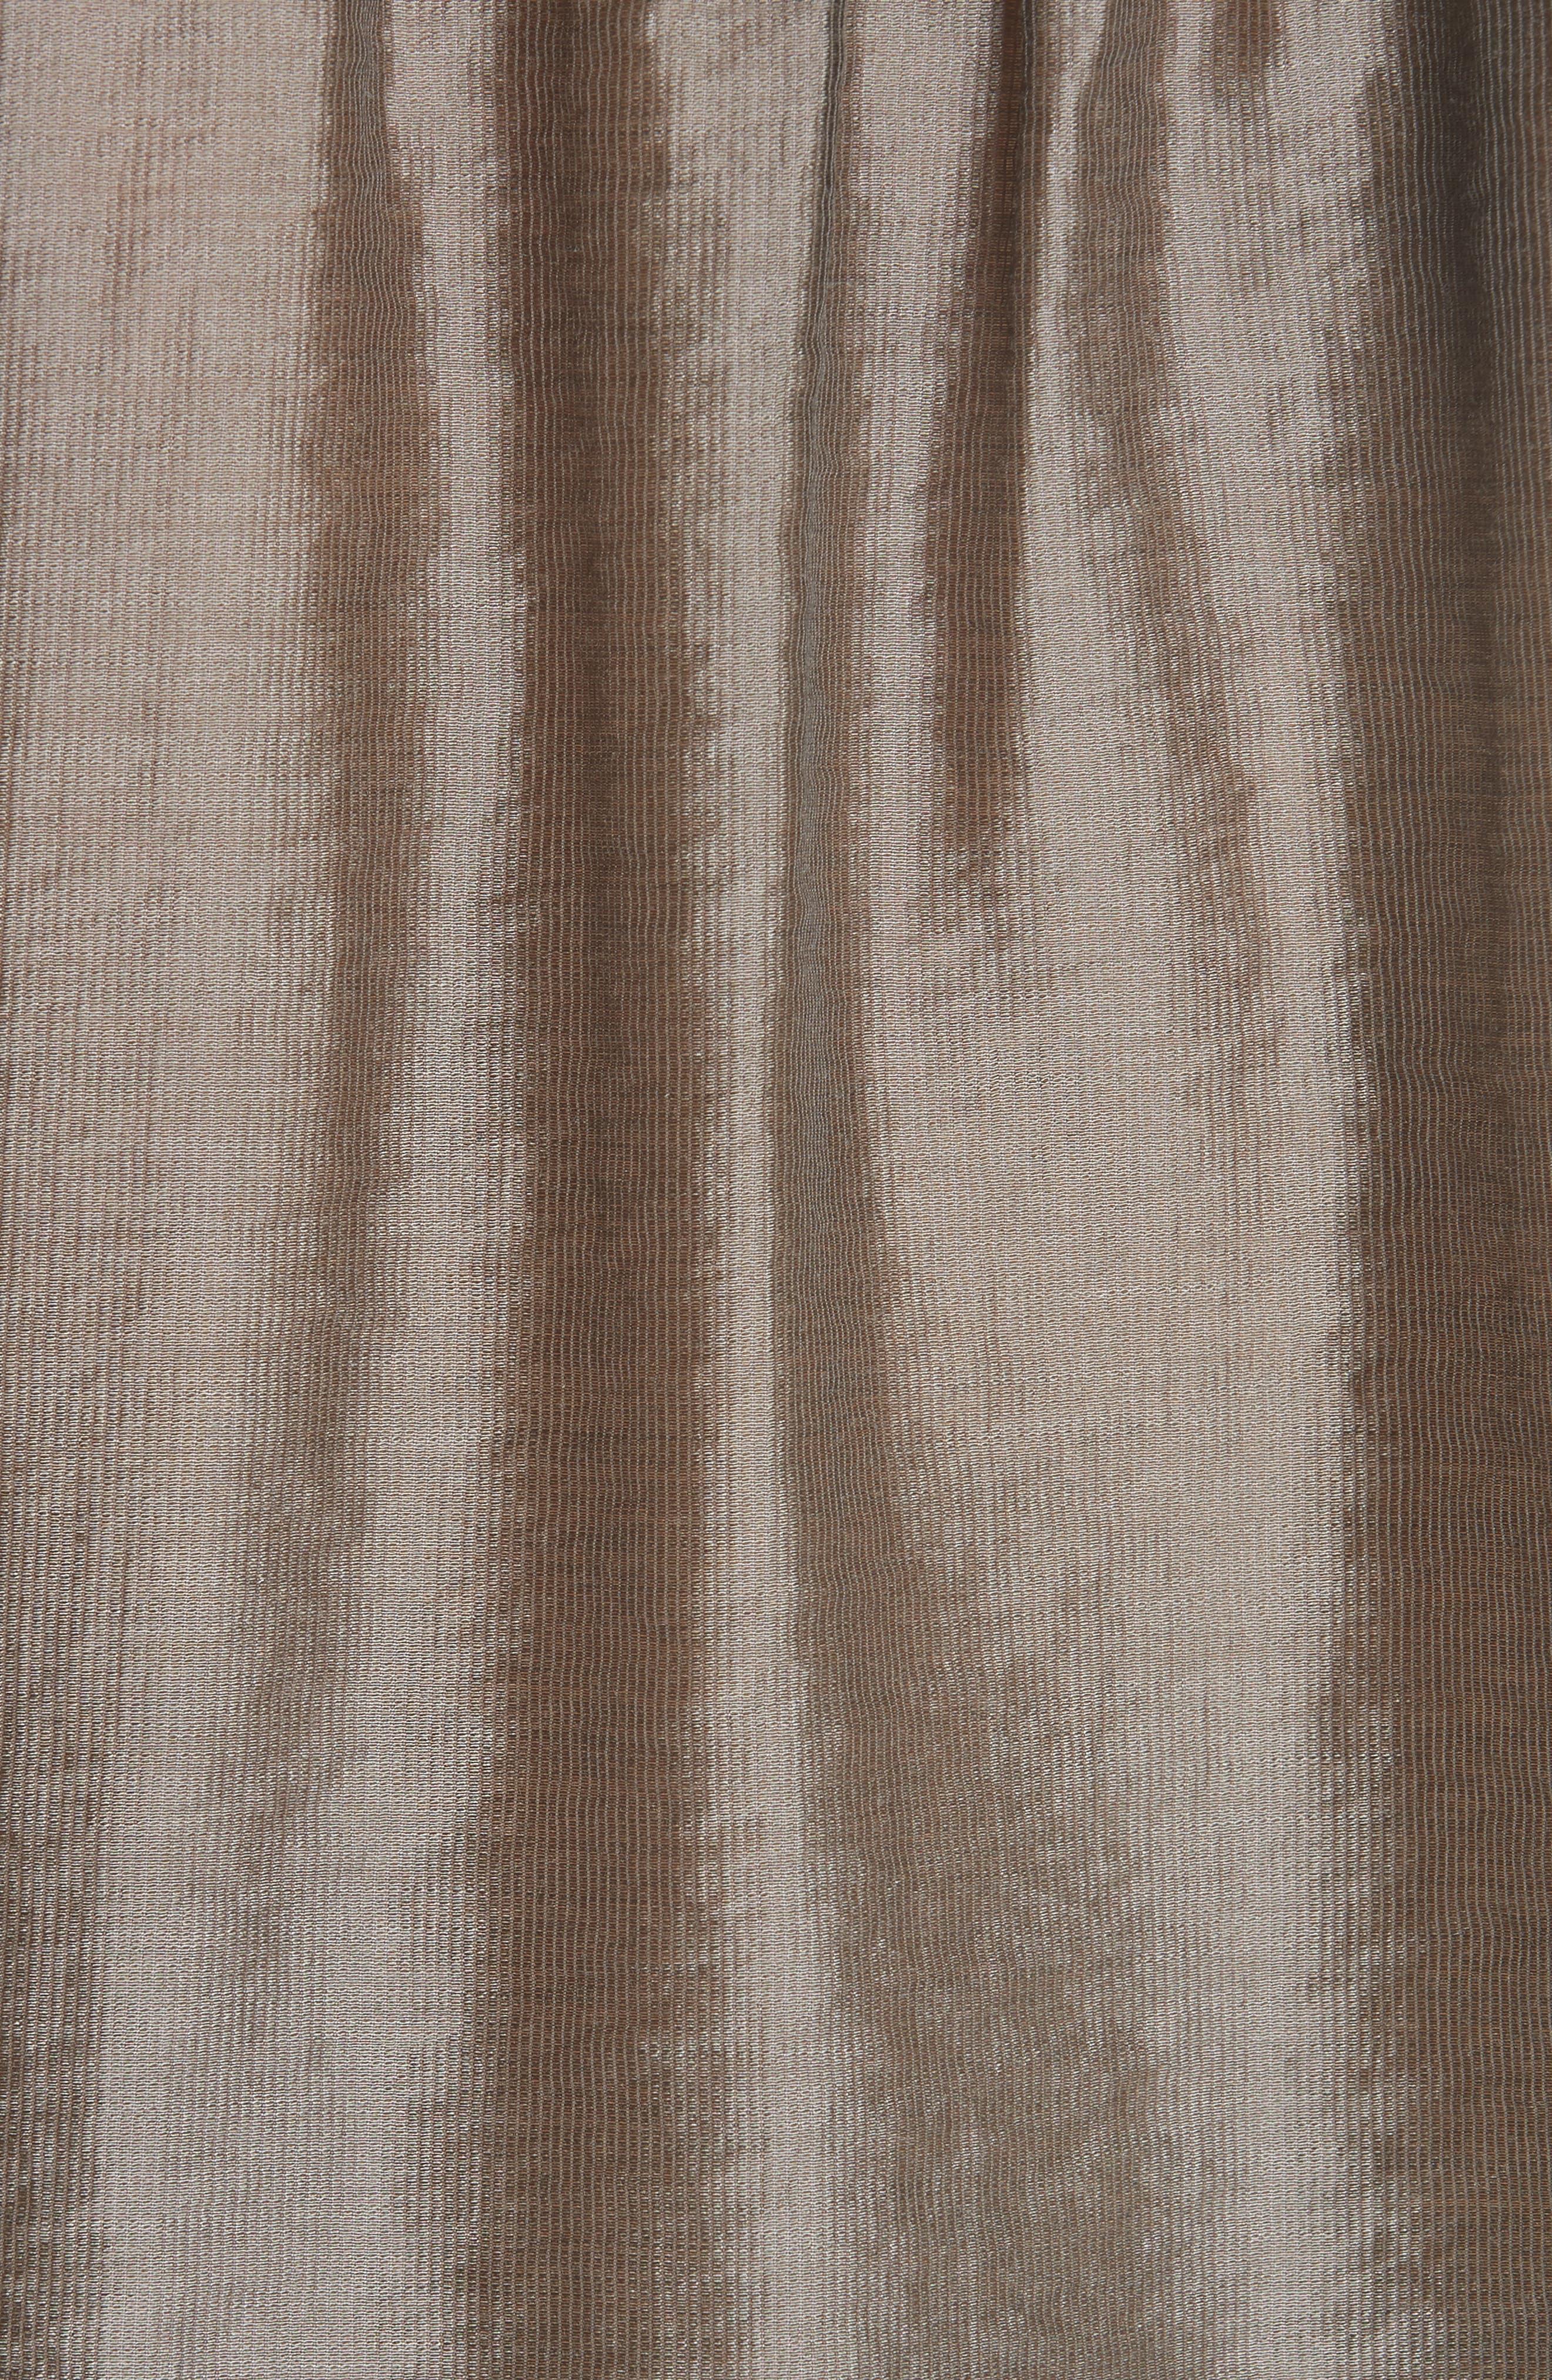 Lidelle Tie Front Tunic Top,                             Alternate thumbnail 5, color,